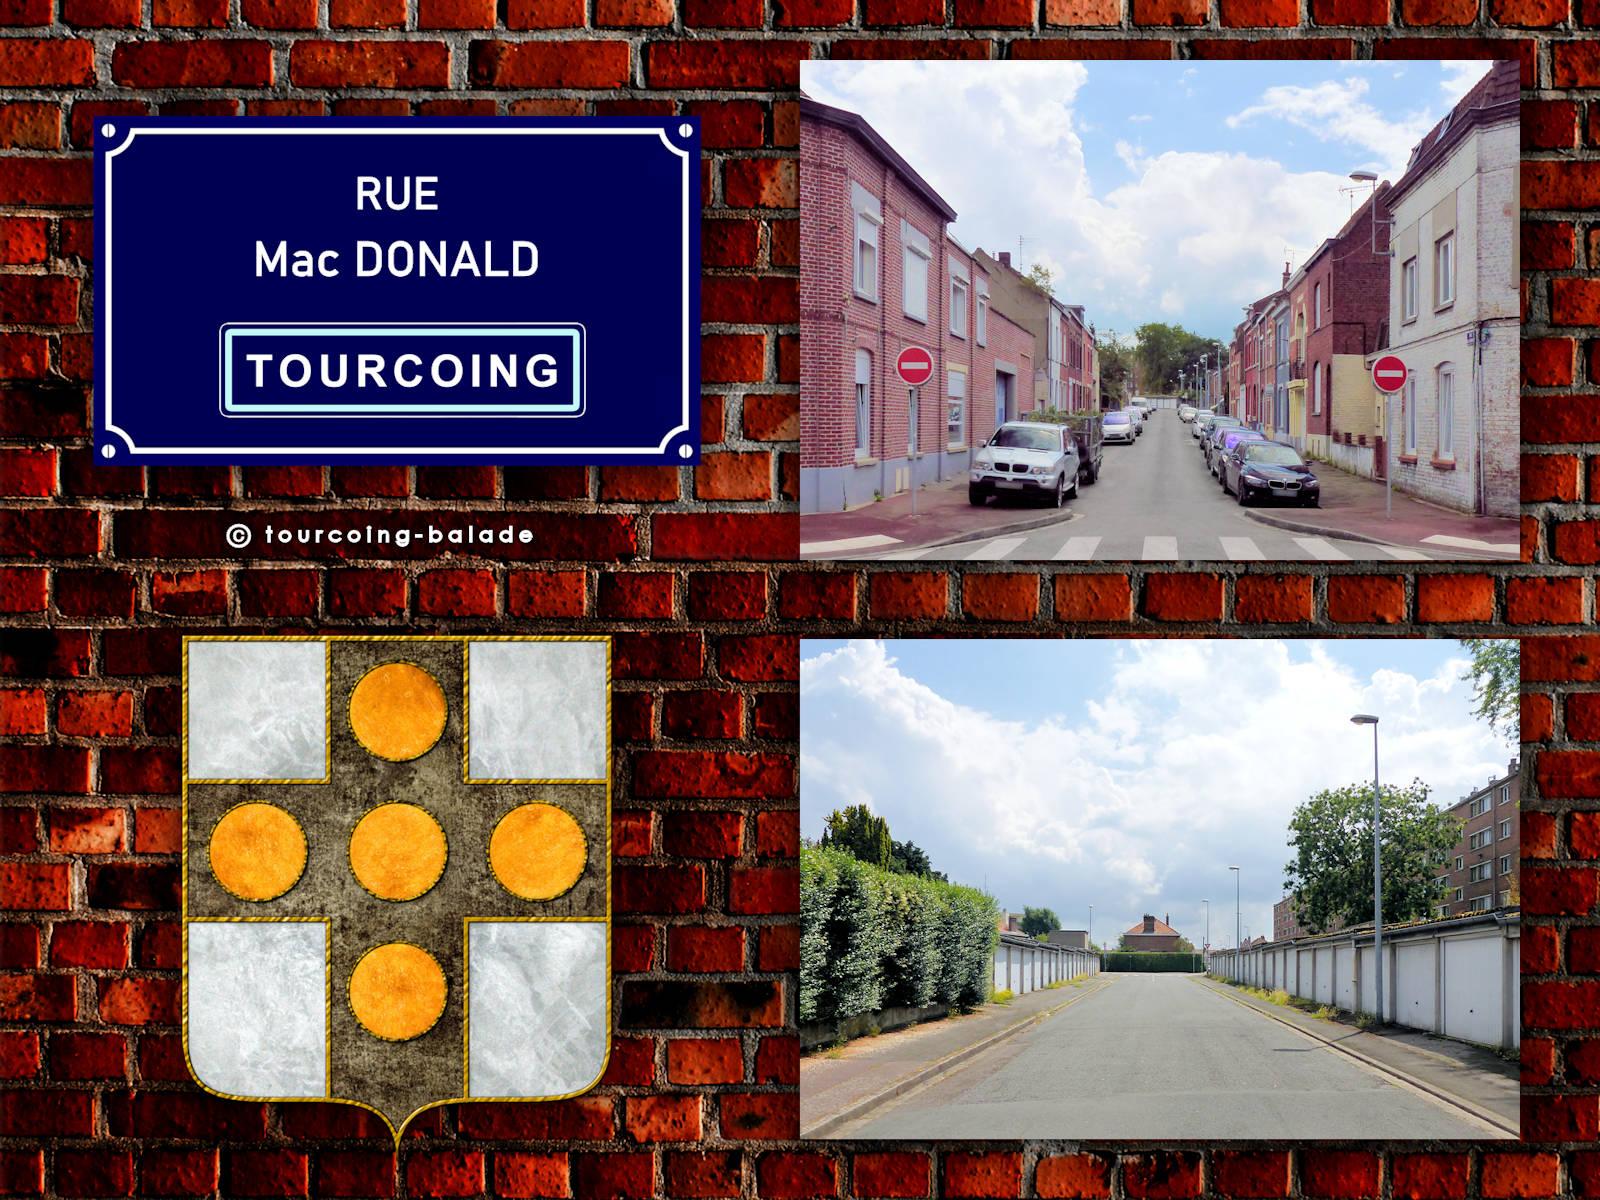 Rue Mc Donald, Tourcoing Pont de Neuville, 2020